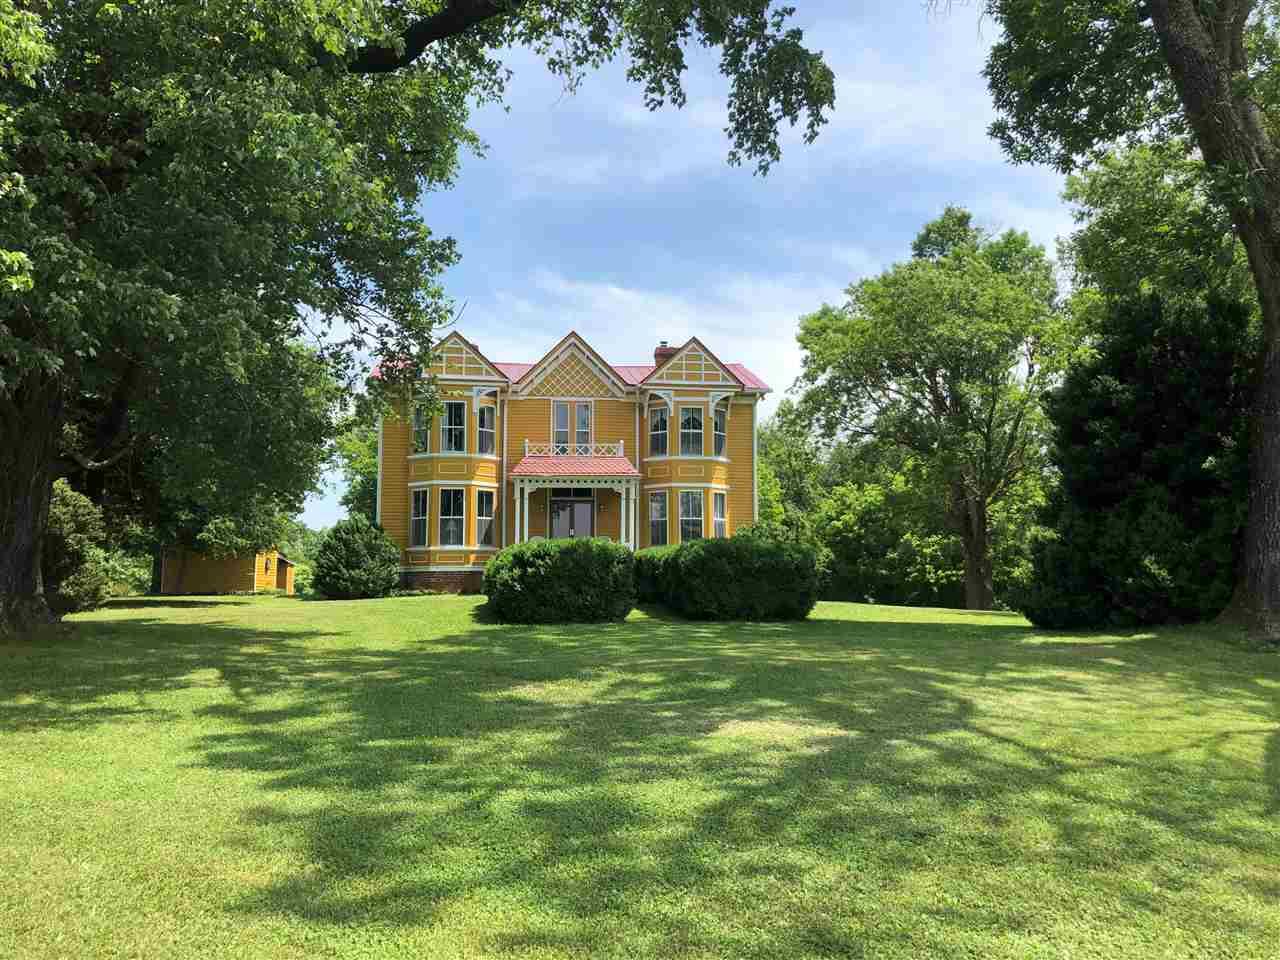 Charlottesville Virginia Farms for Sale on 5 acre horse farm design, farm layout design, 2 acre farm design,